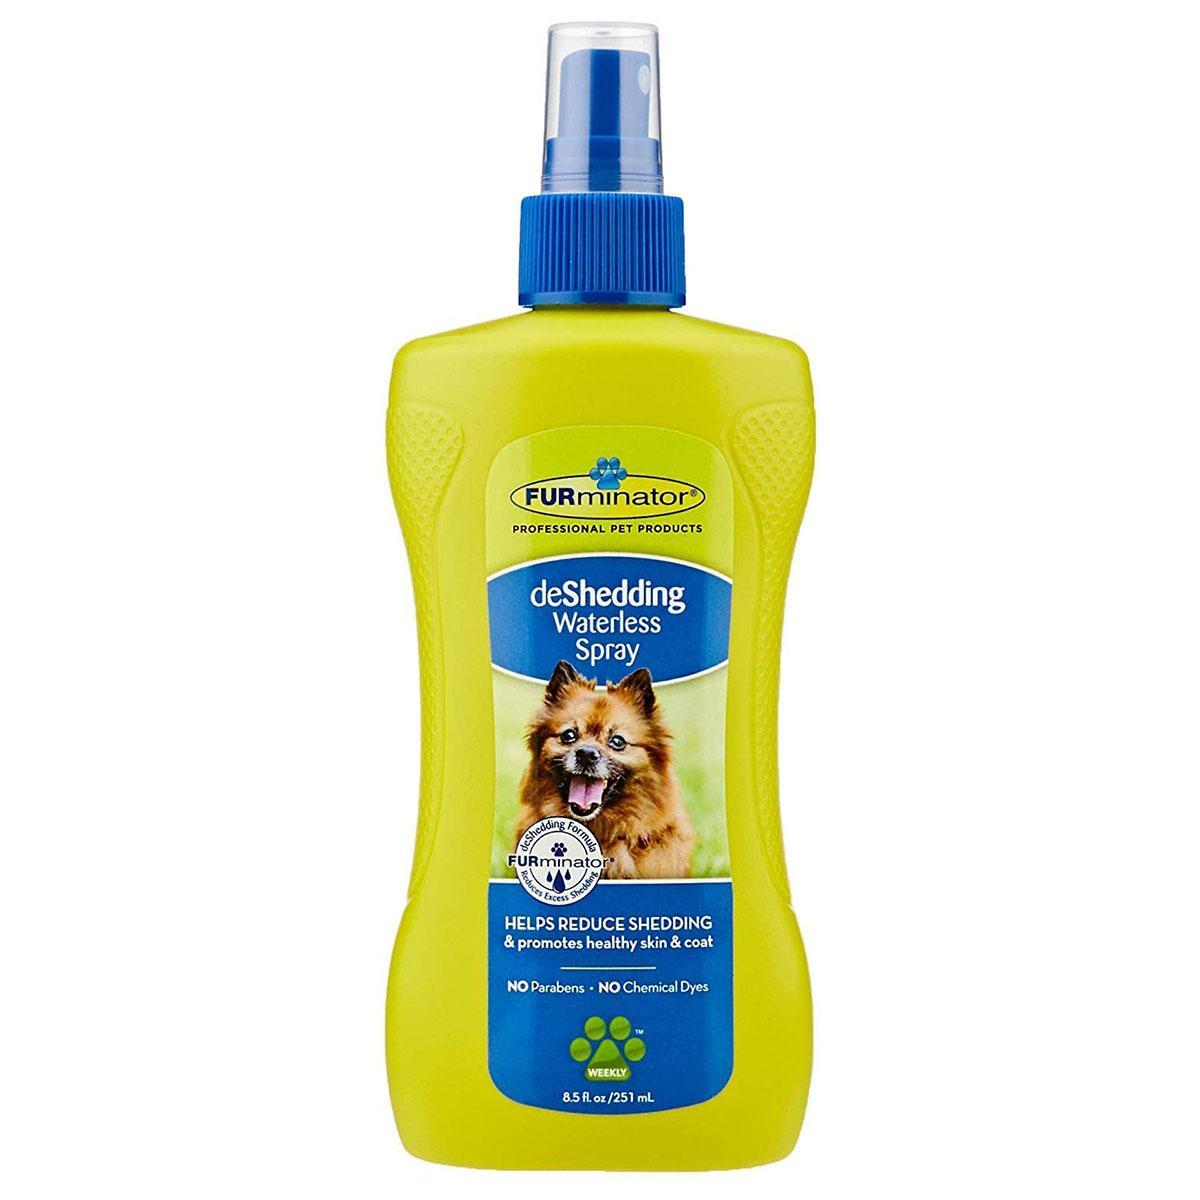 DeShedding Waterless Pet Spray by FURminator